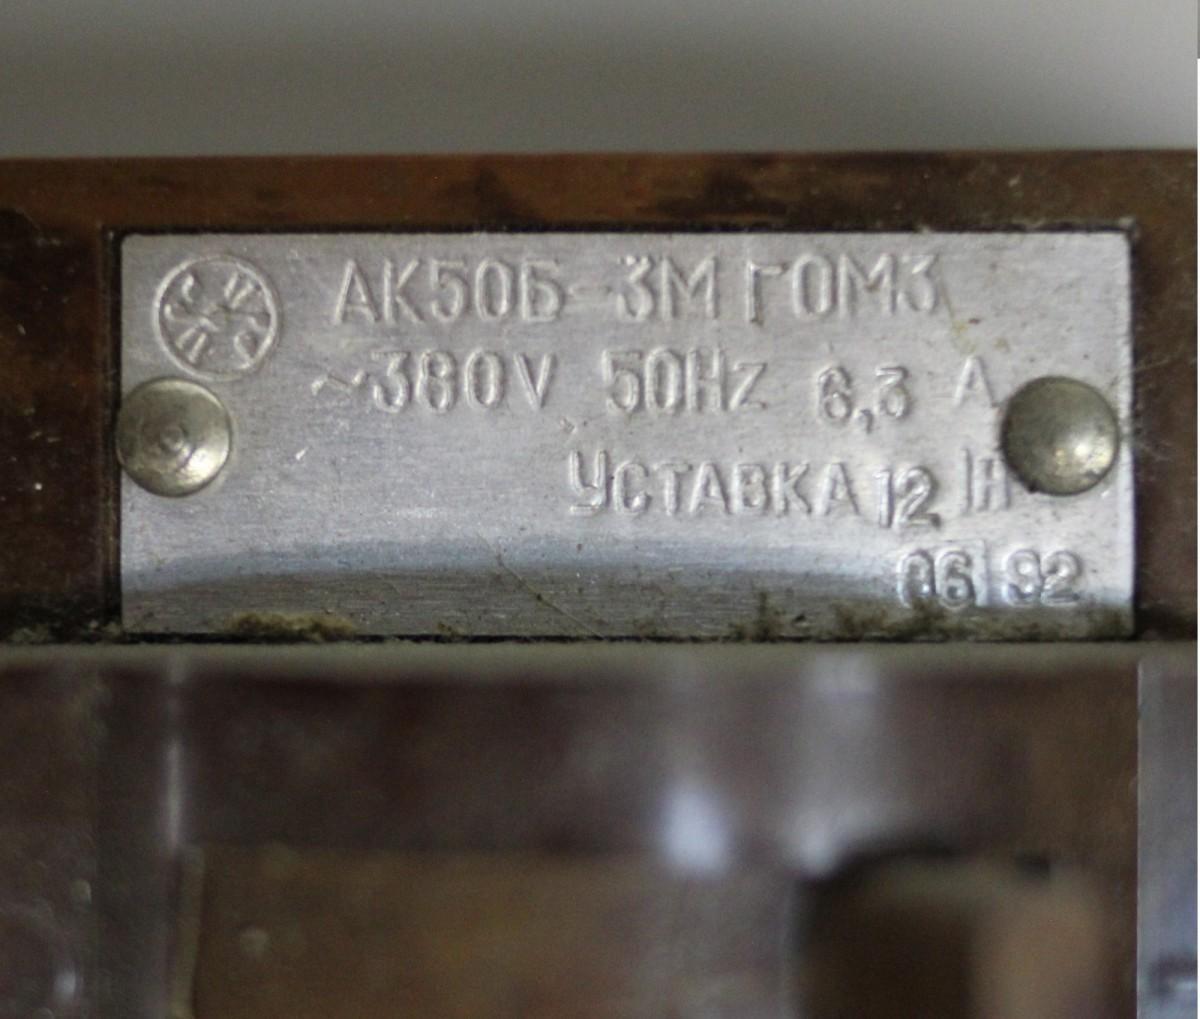 AK 50-3 6,3 А assault rifle (12)